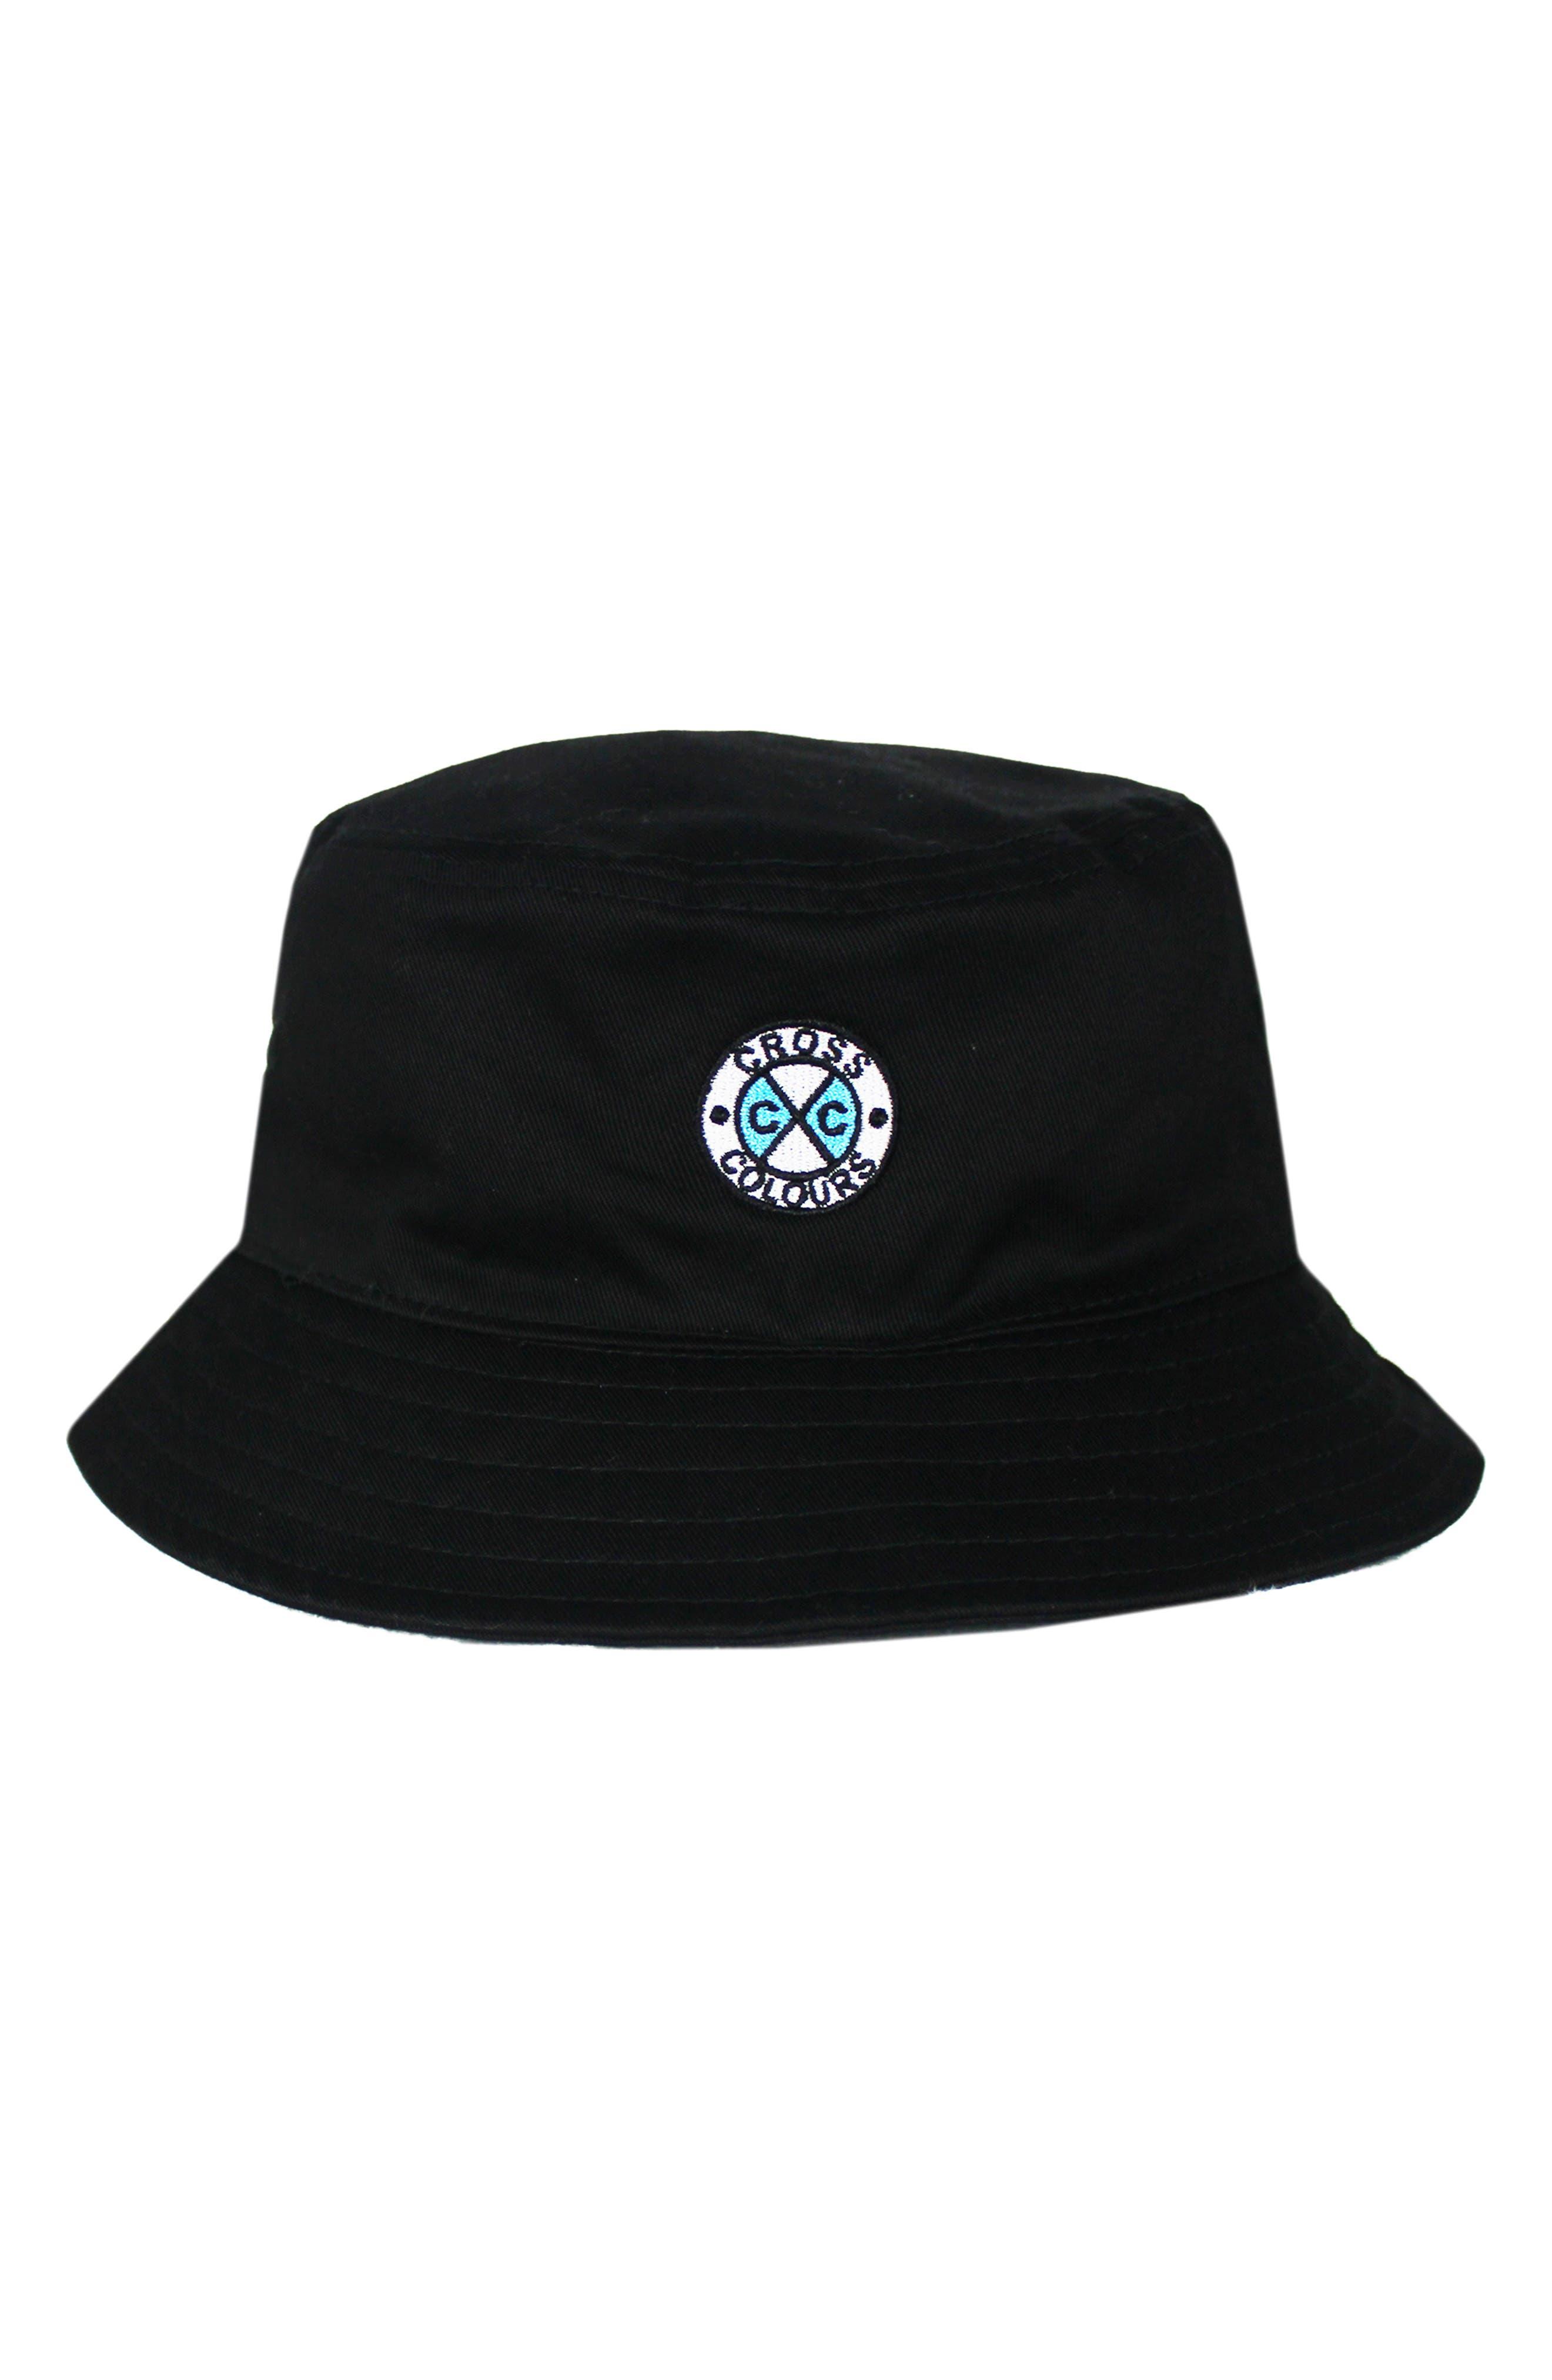 'Boyz N The Hood' Impala Blues Bucket Hat